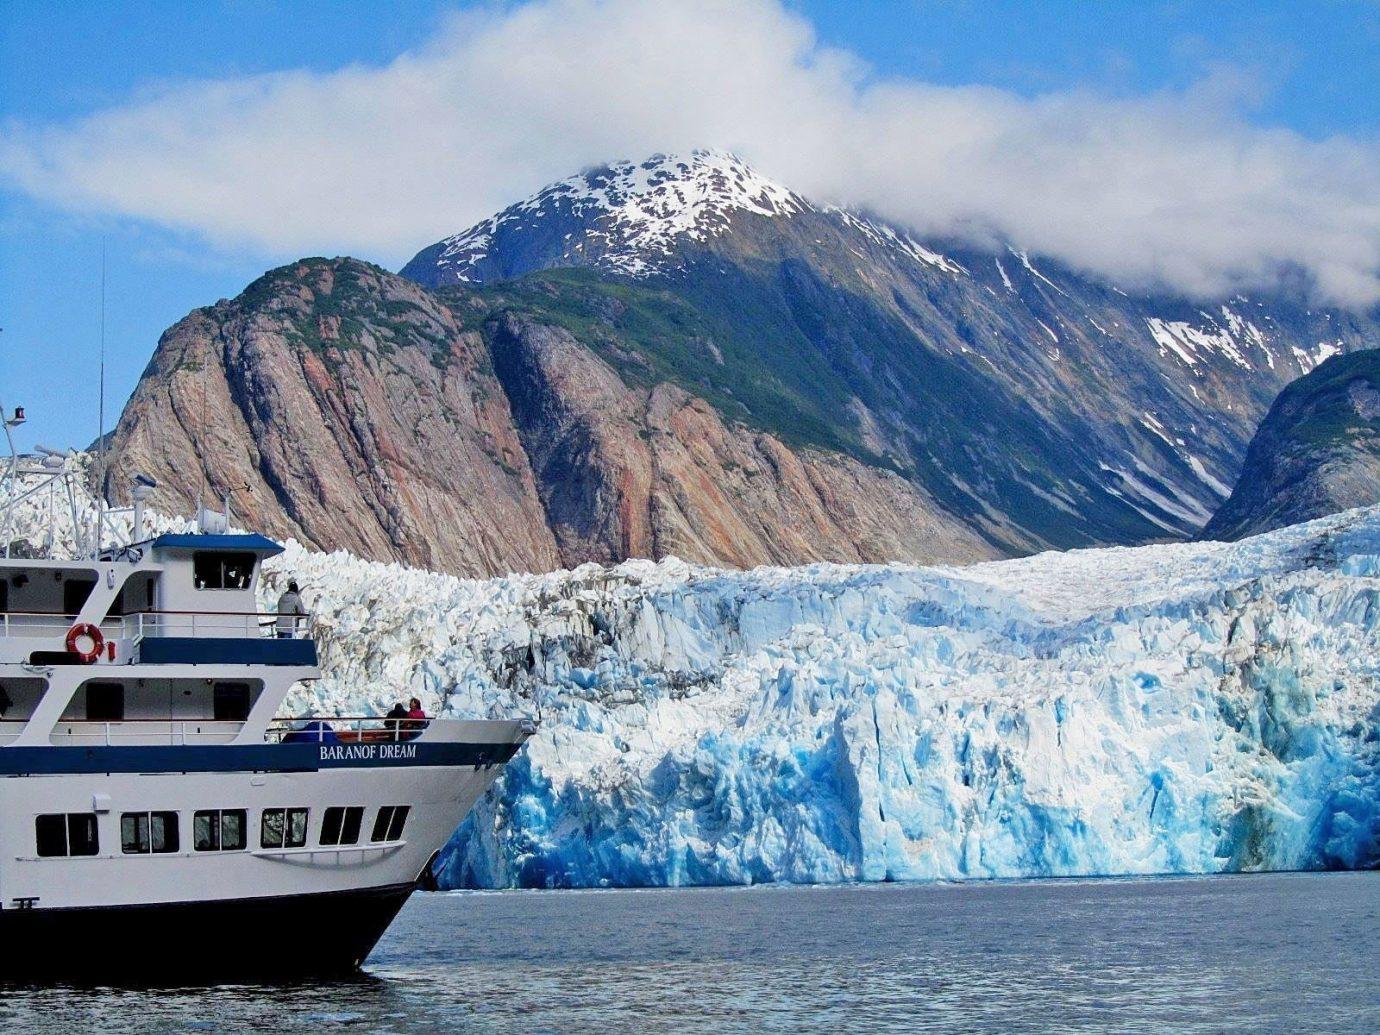 Trip Ideas mountain outdoor sky geographical feature landform Boat glacier vehicle fjord mountain range glacial landform Sea arctic arctic ocean Lake